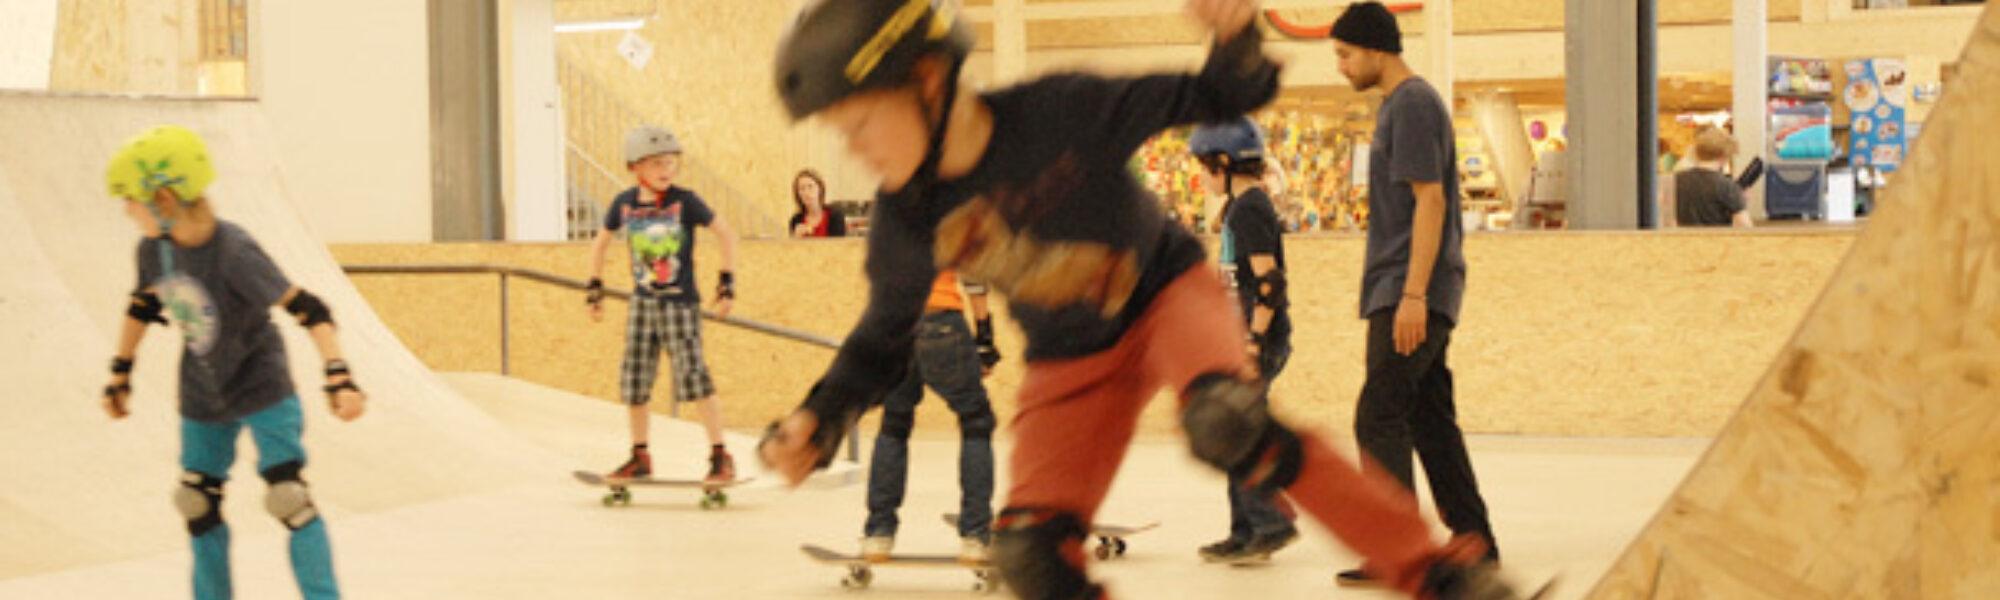 Rolling Rock Skate- & Sportcenter